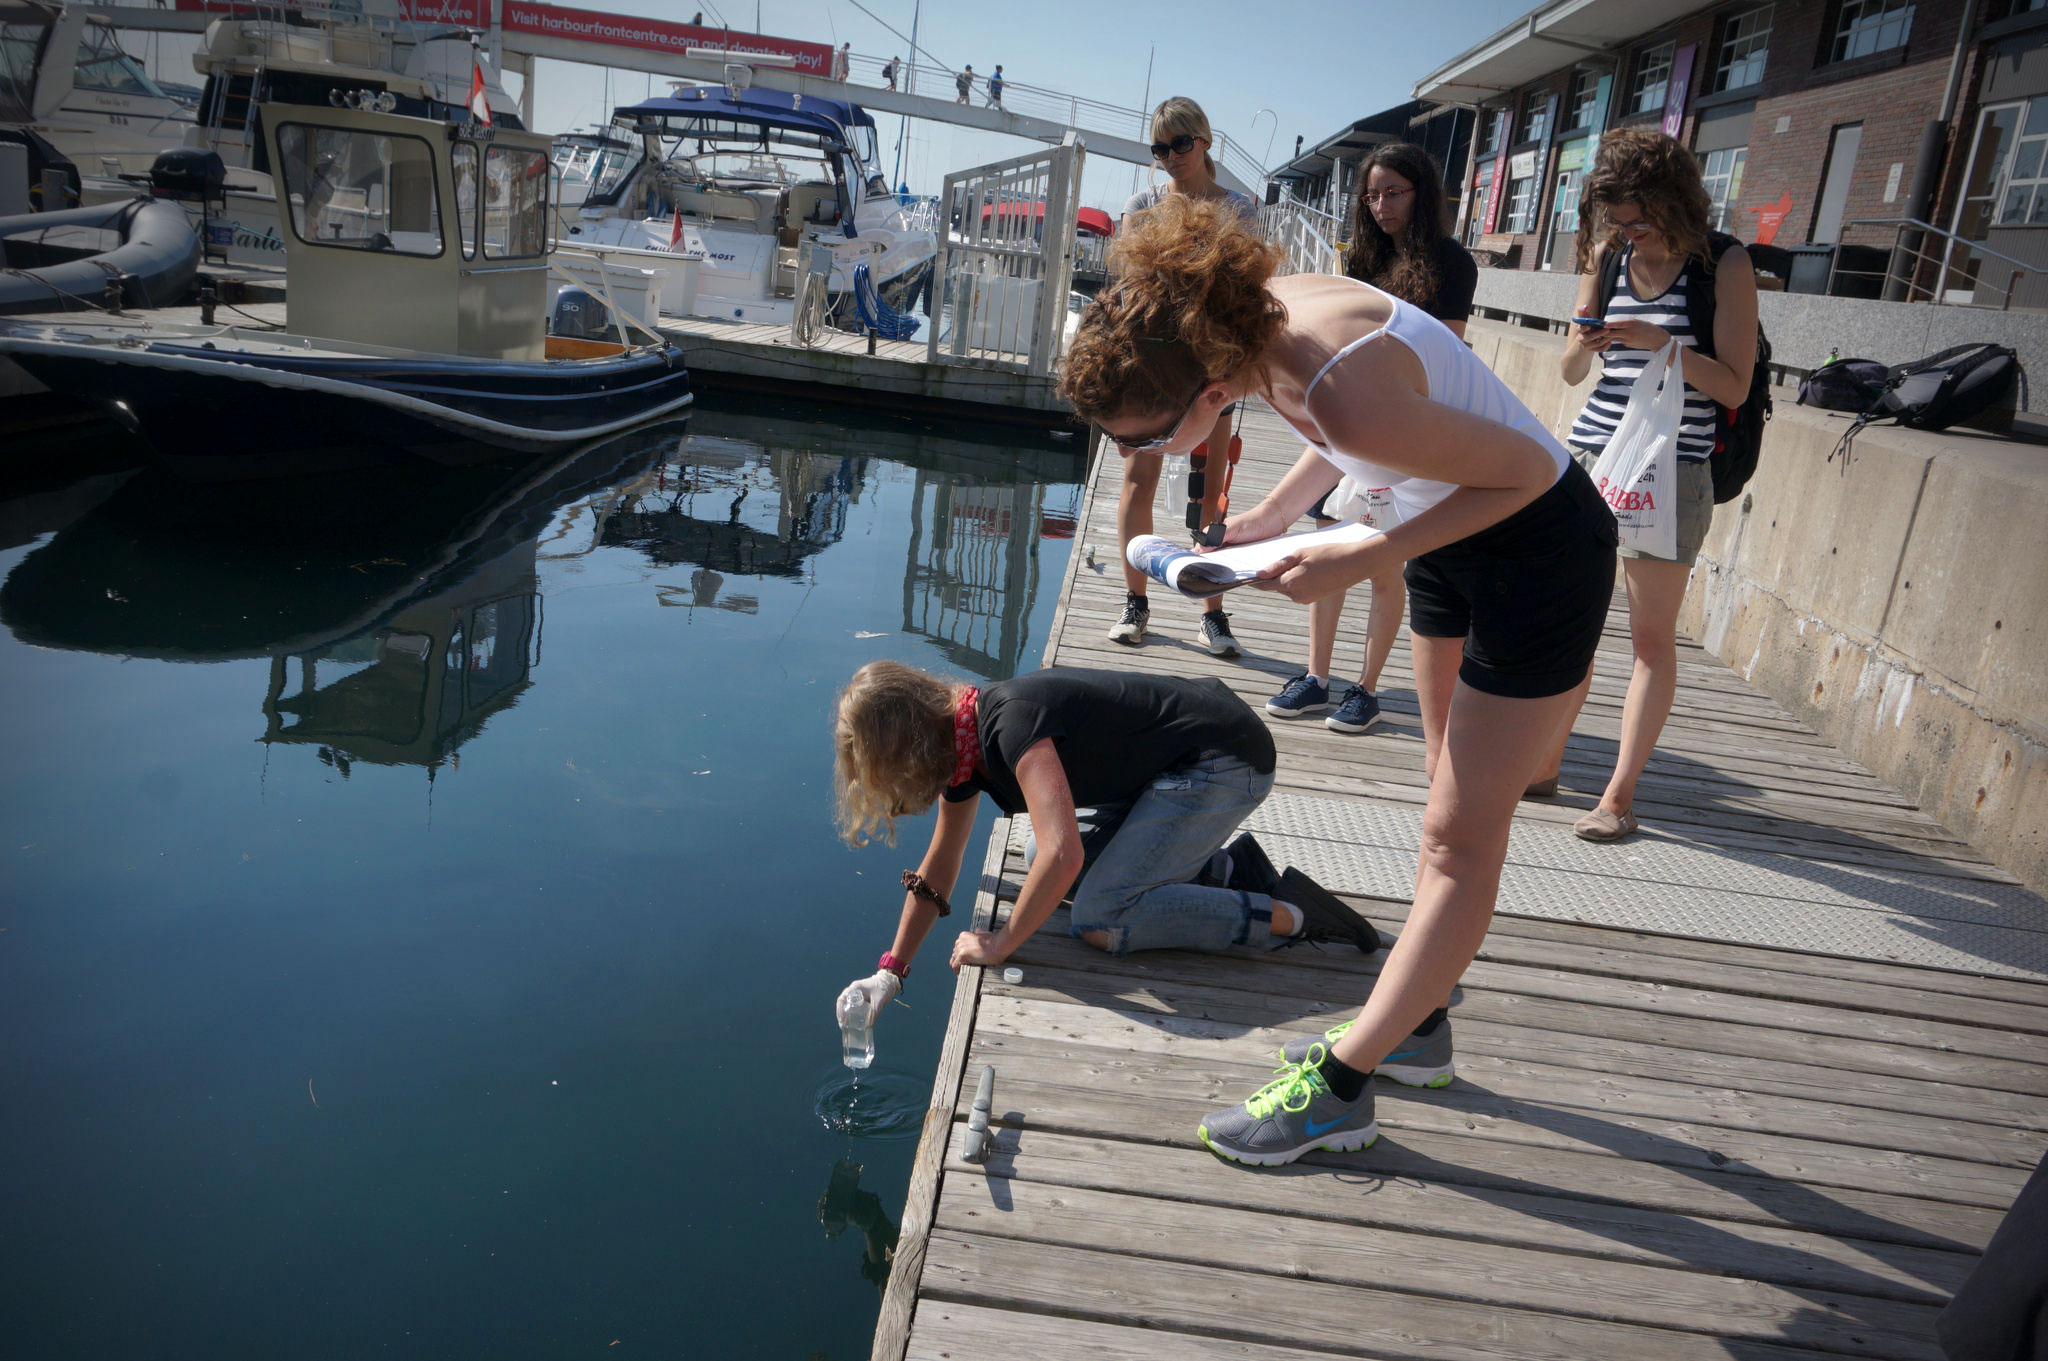 Volunteers gathering water samples along Toronto's harbour. (Photo by Li Black)